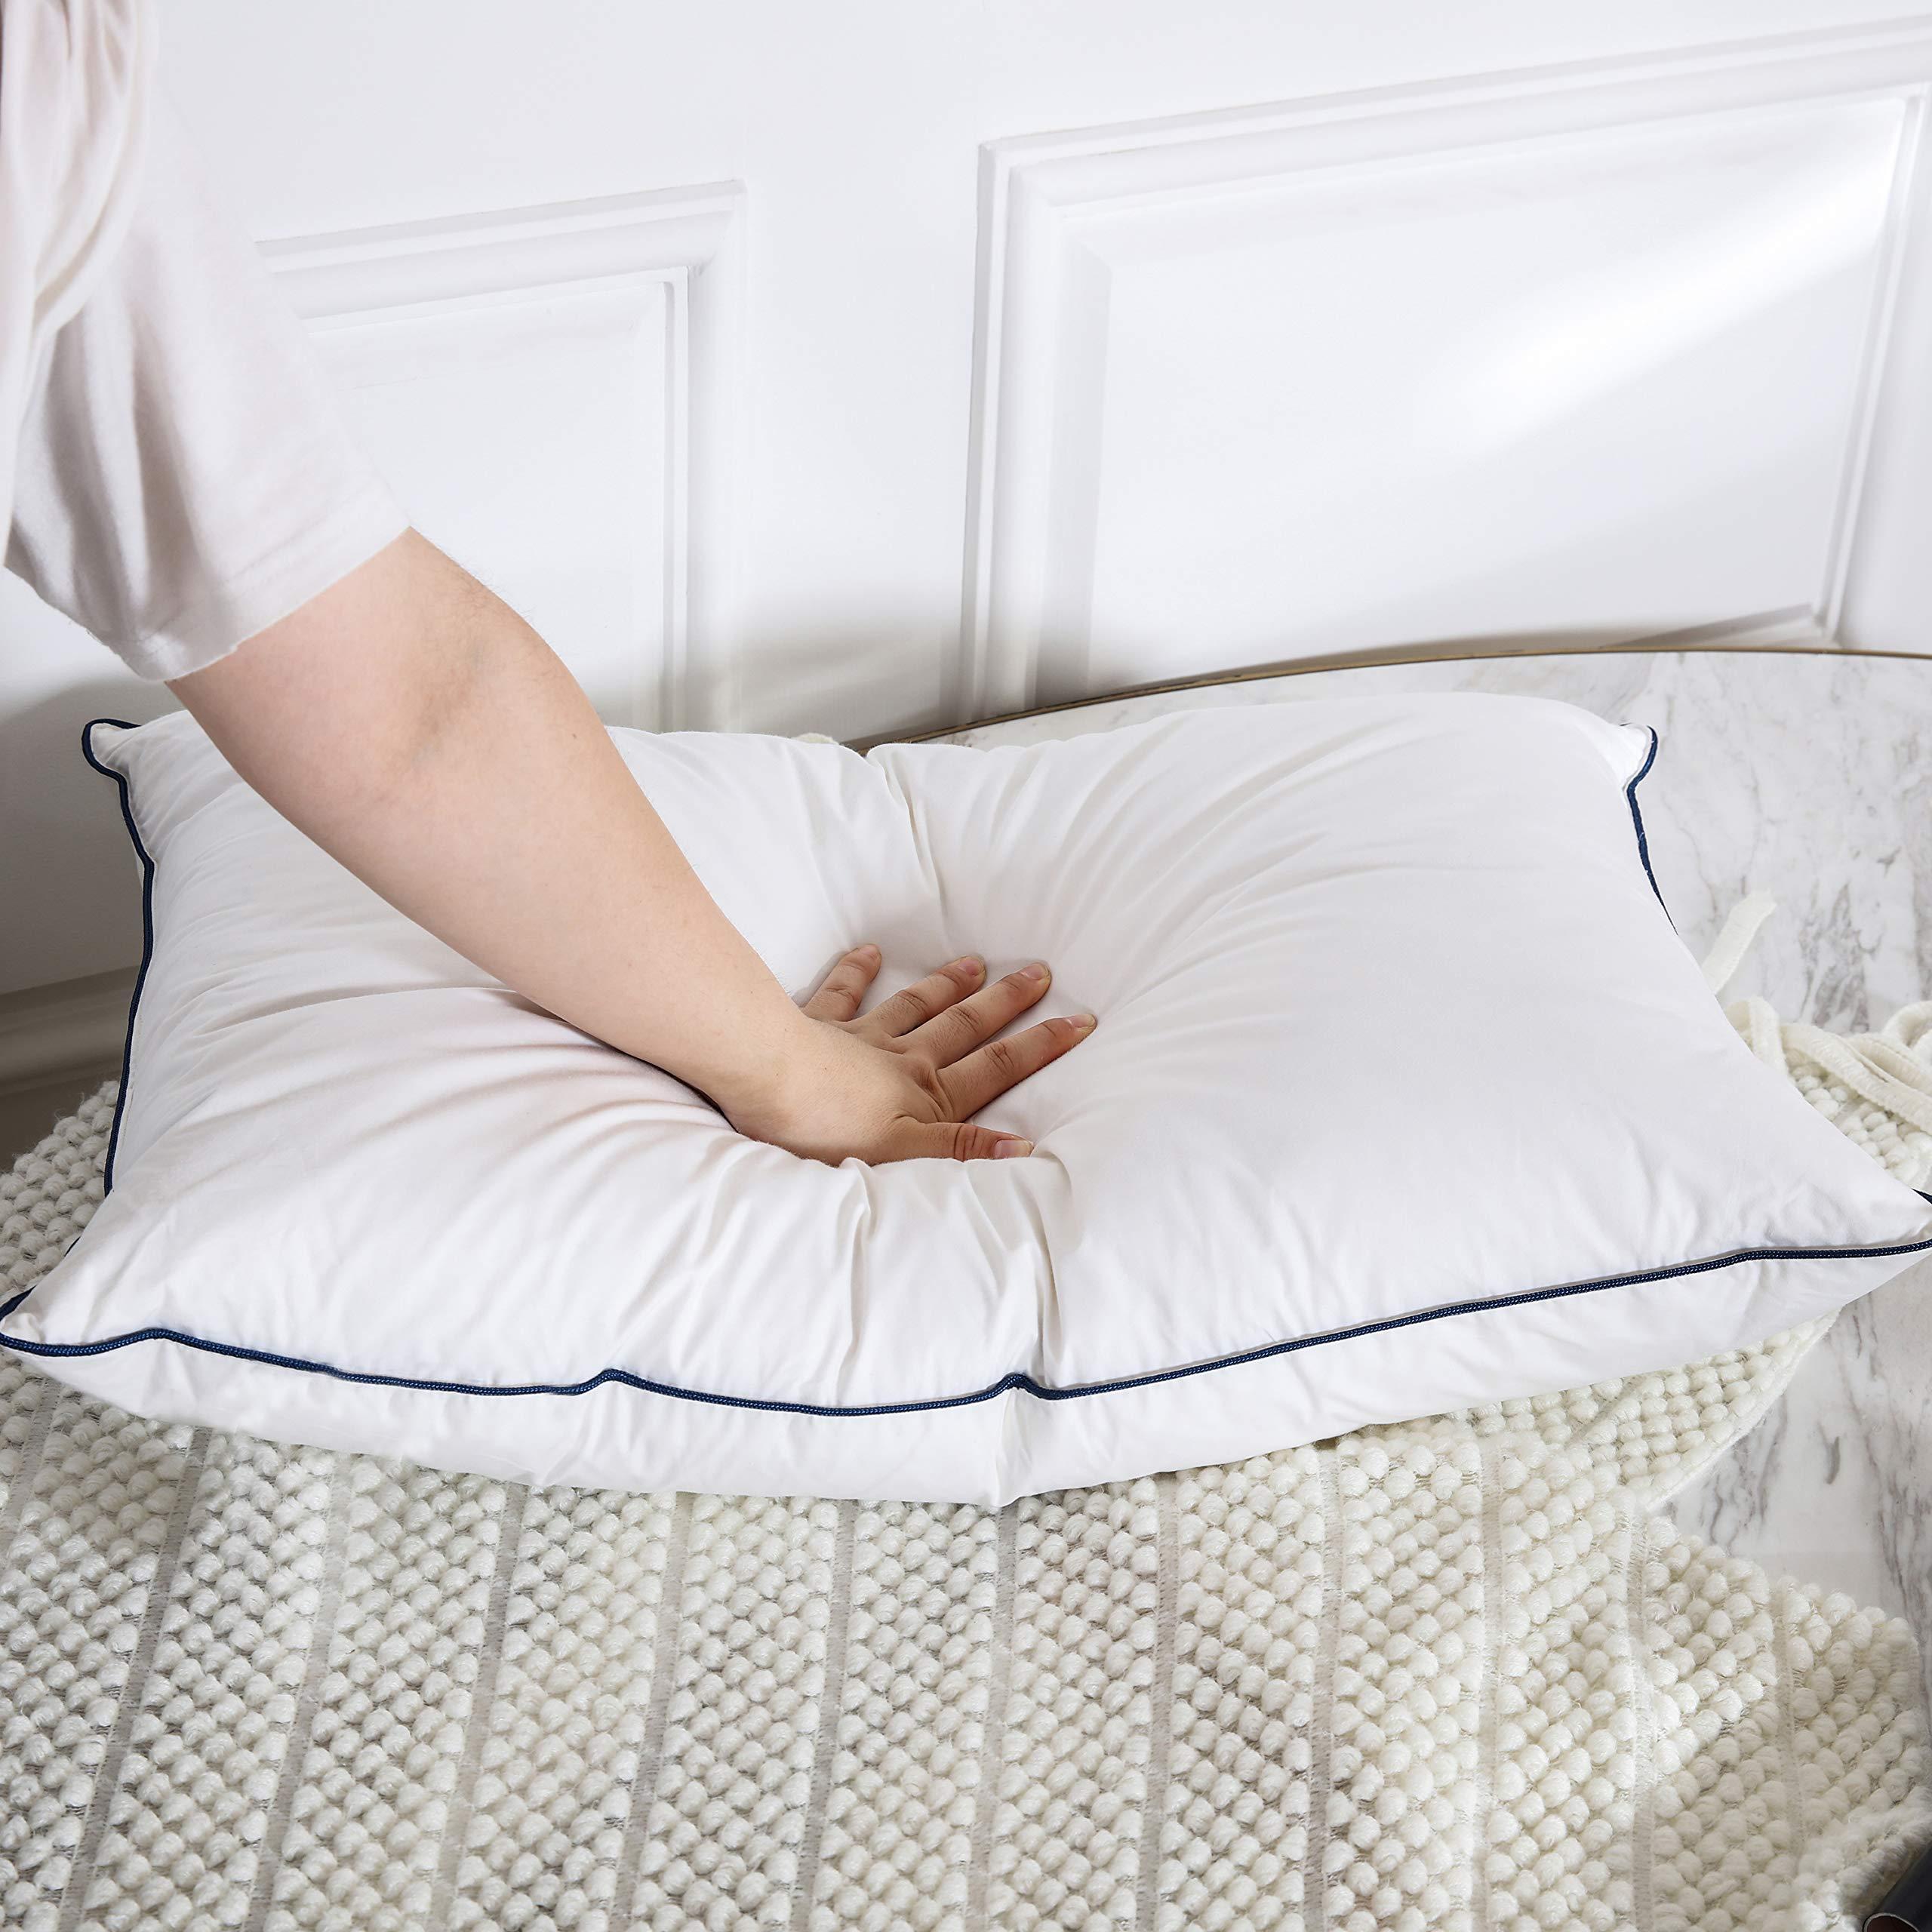 Doriness Goose Down Pillows For Sleeping Set Of 2 Queen